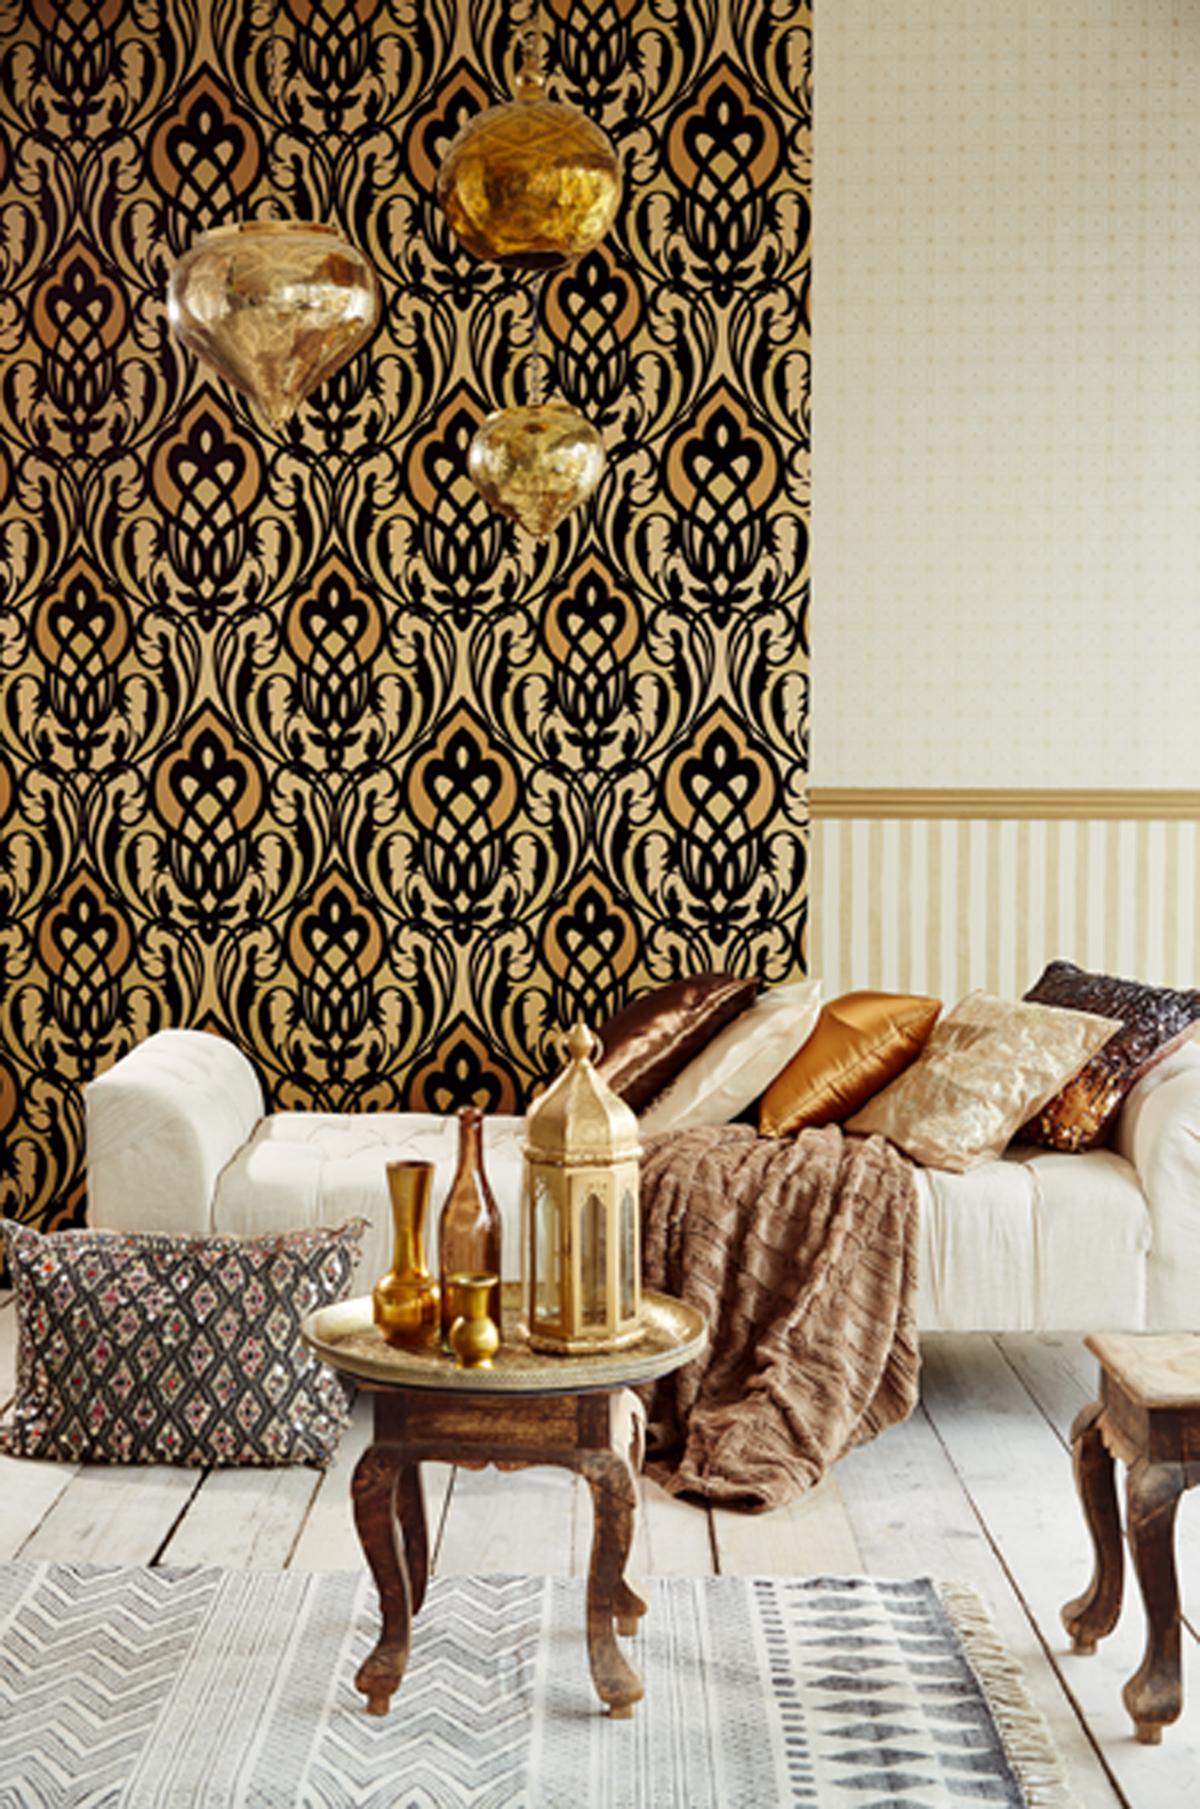 splash of gold metallic in decor